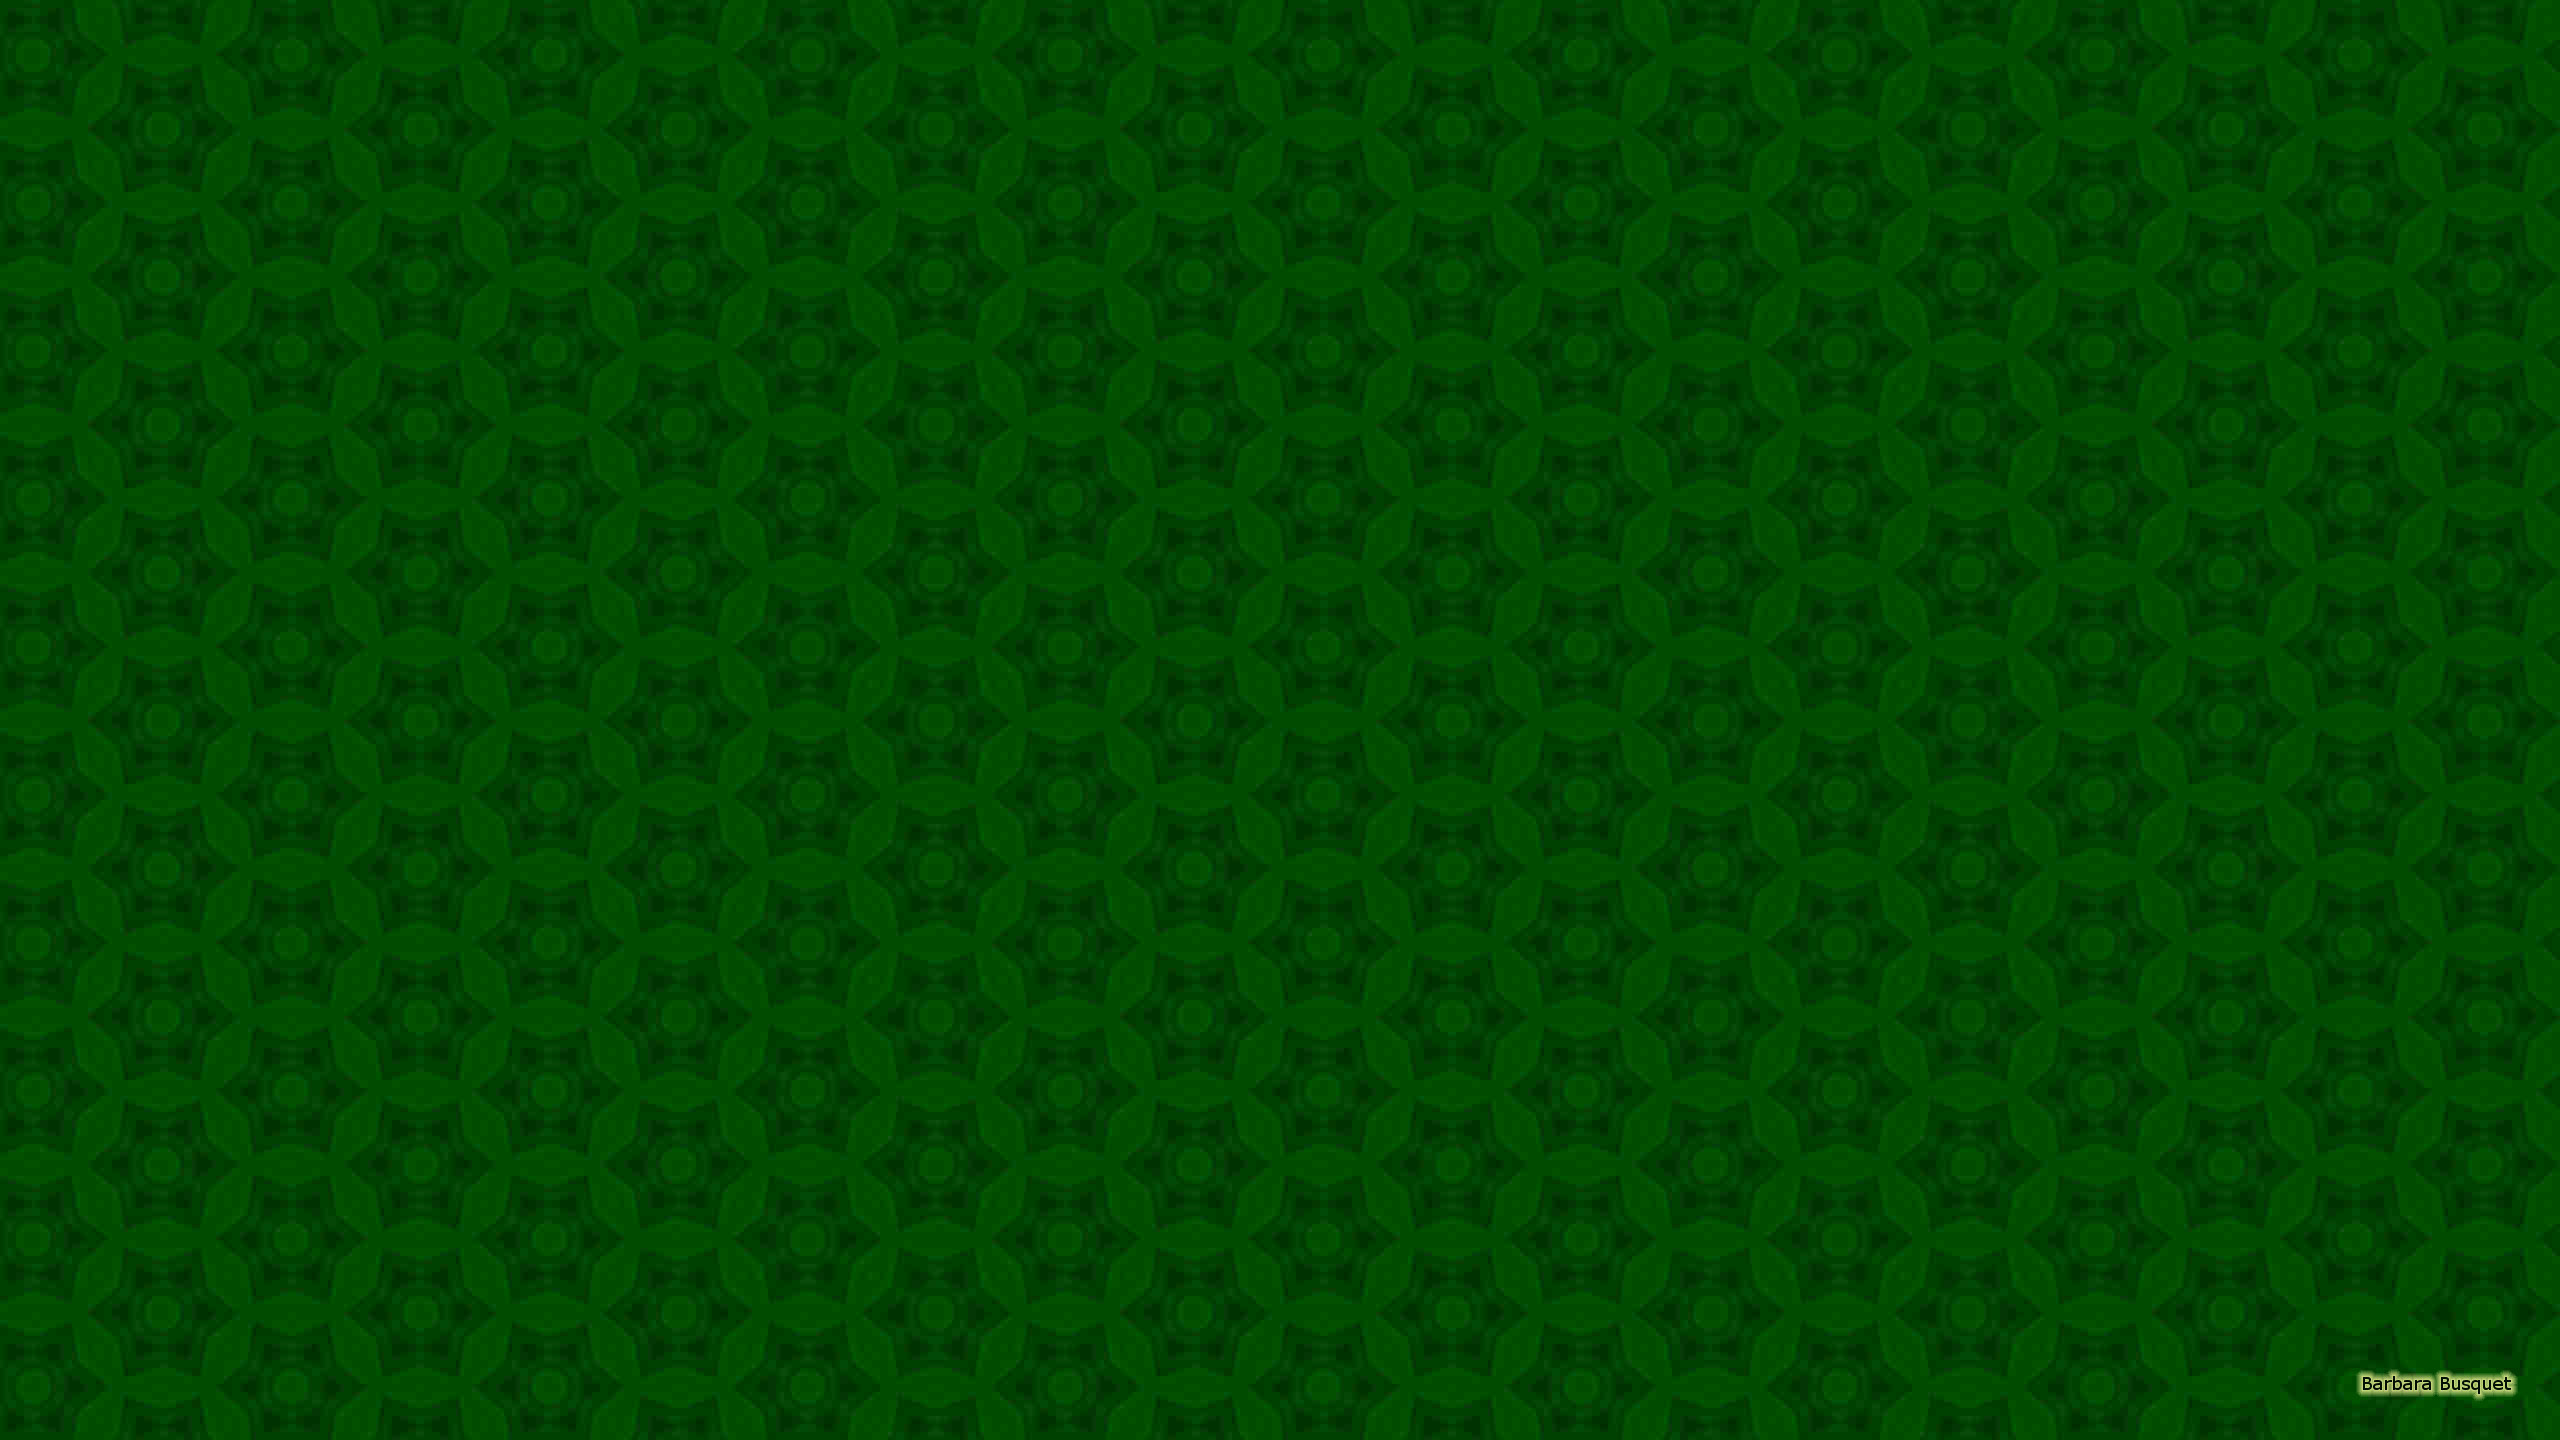 1920x1080 Hd Green Neon Wallpaper Desktop Wallpapers Amazing Images Windows High Quality Artworks Dual Monitors Ultra 4k 1920A 1080